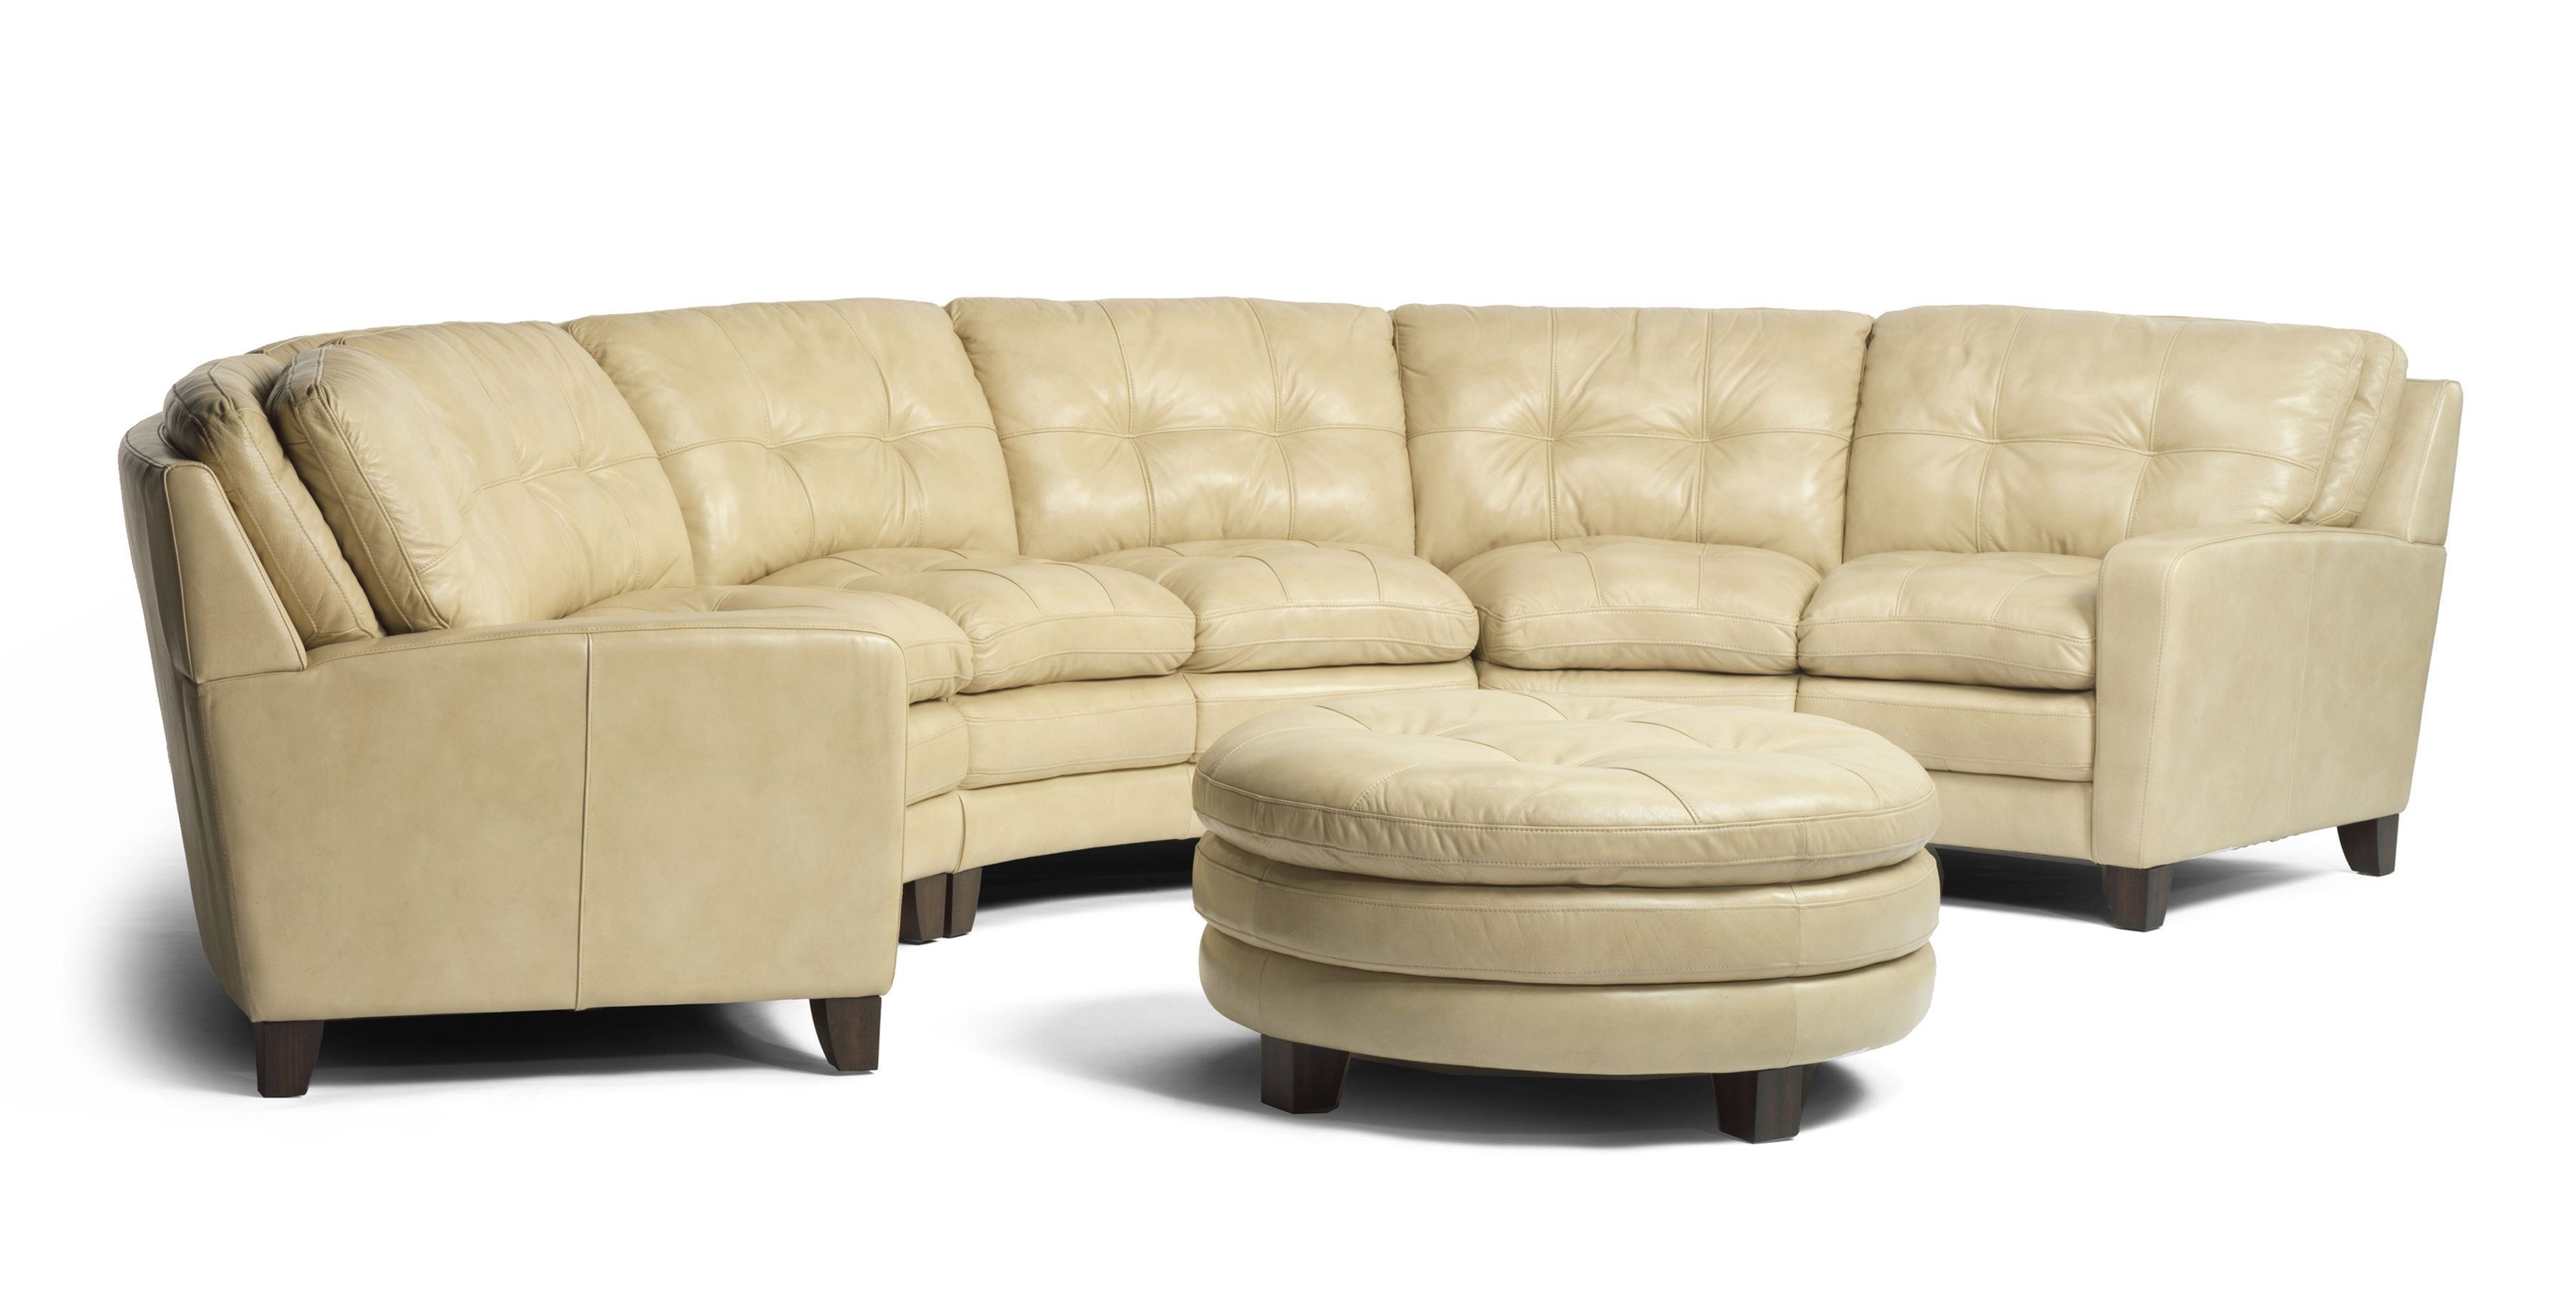 Gorgeous cream leather conversation sofa. www.awfurniture.com ...